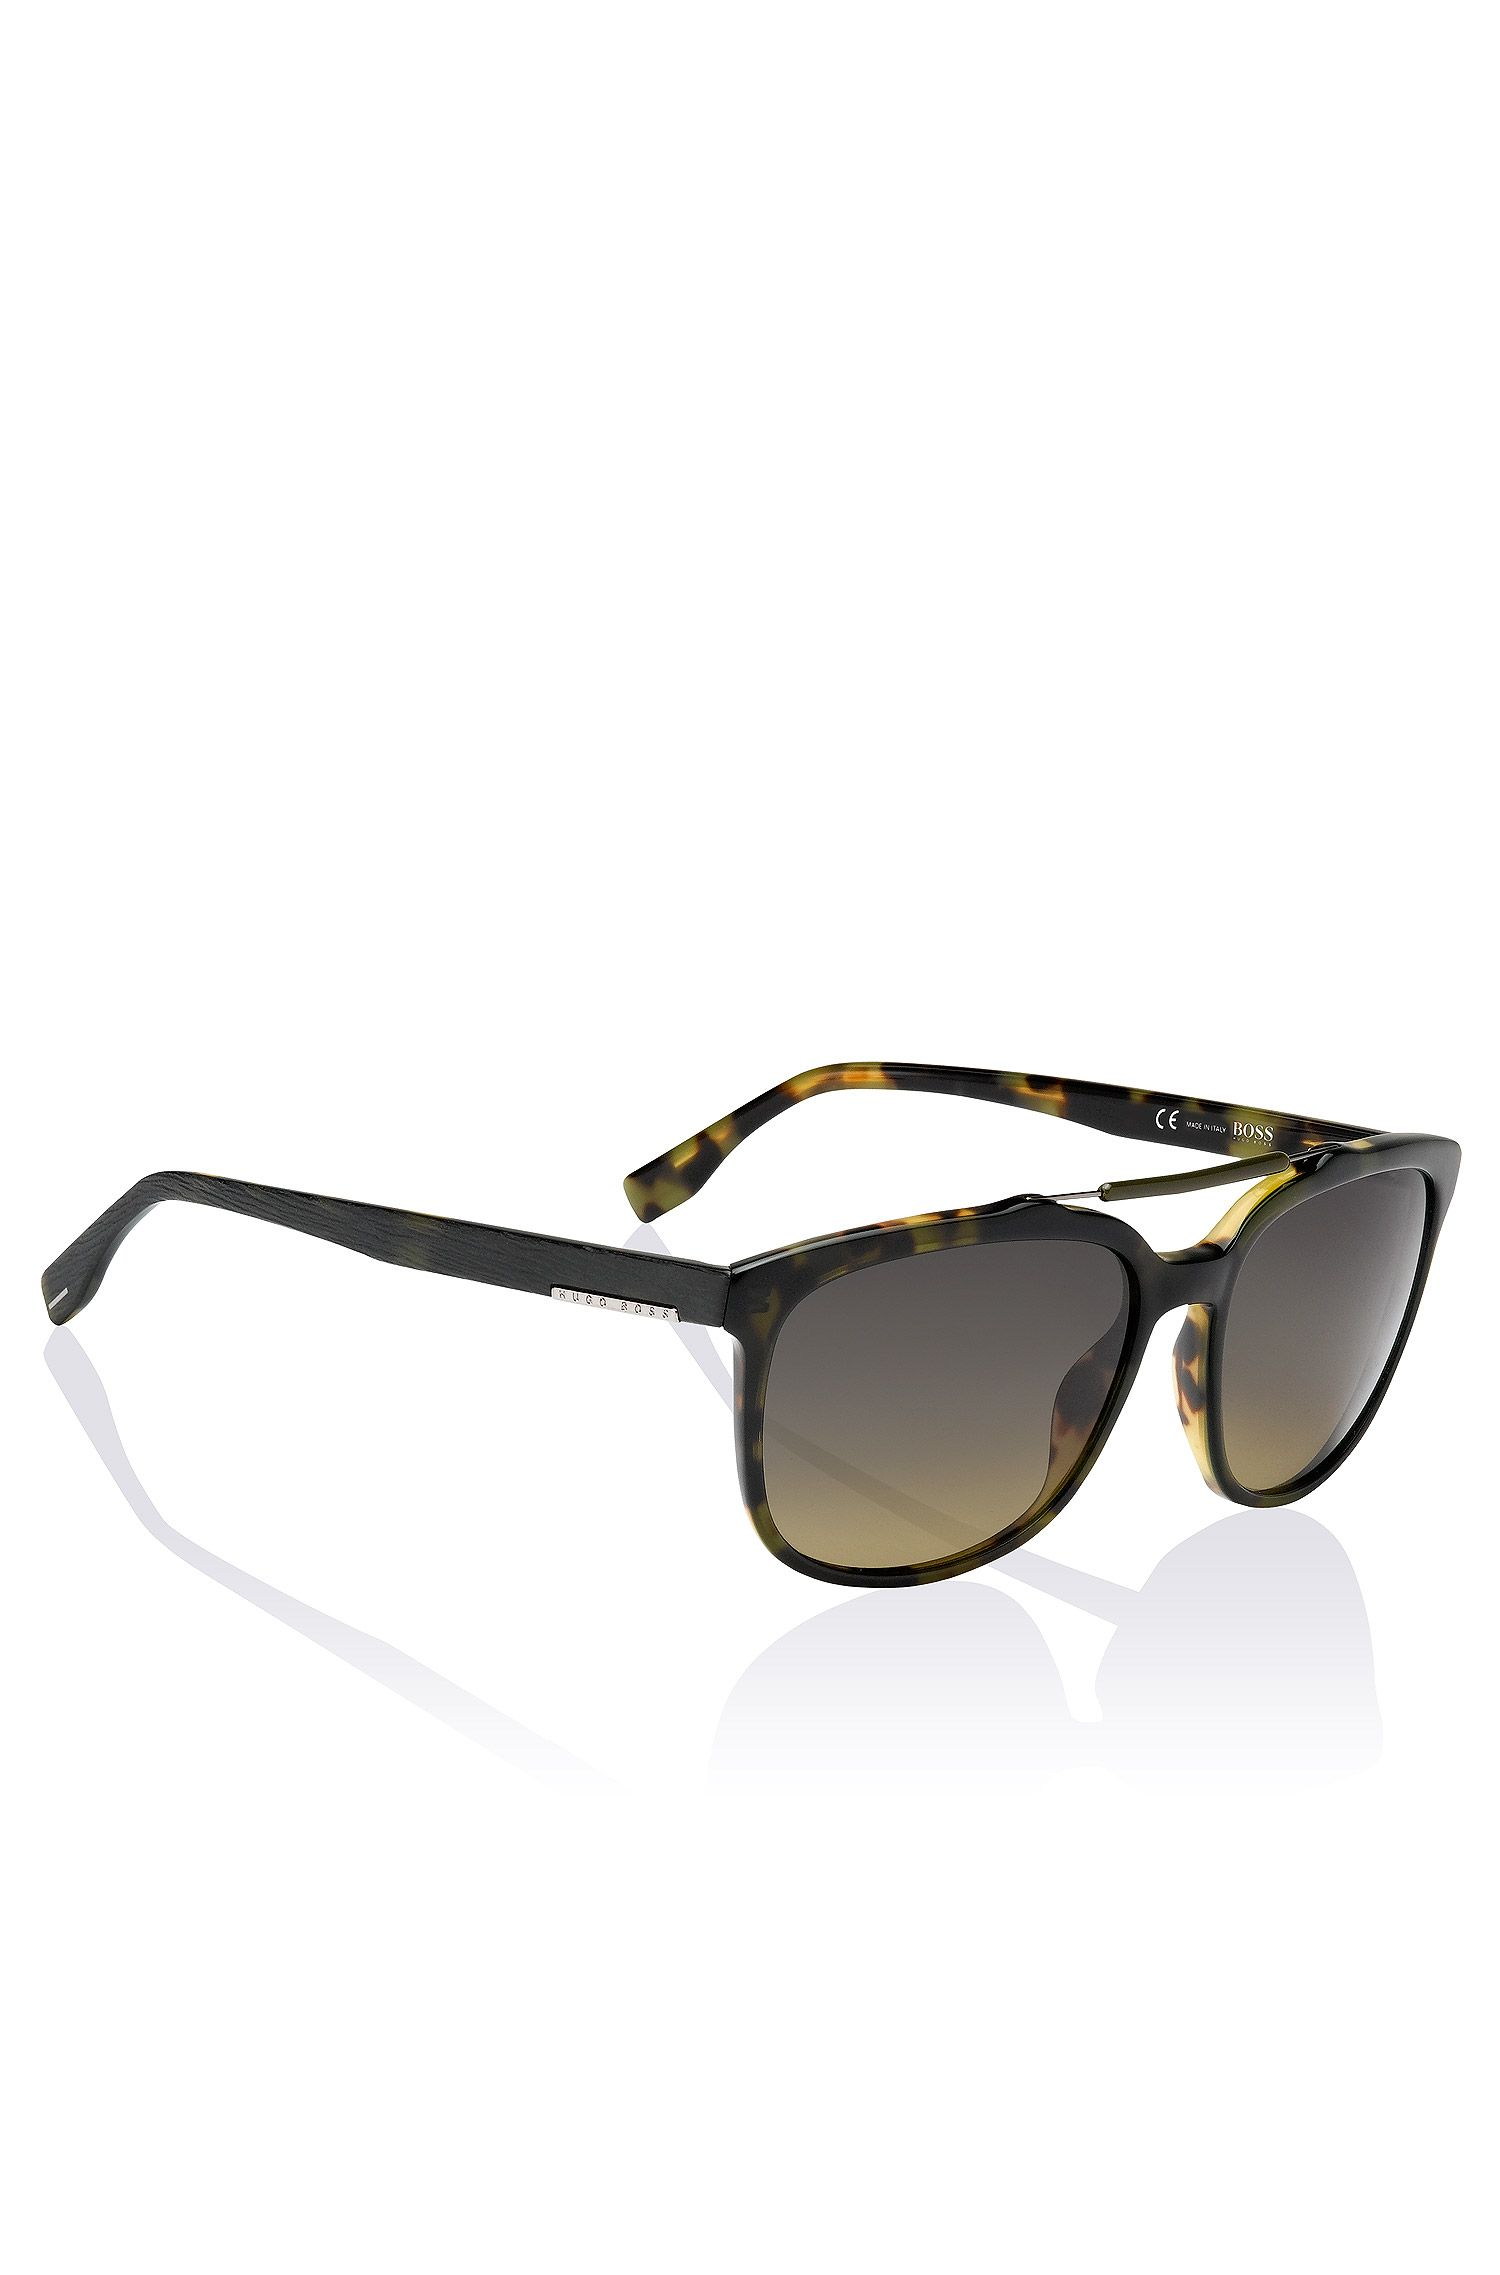 'BOSS 0636/S' acetate sunglasses, Assorted-Pre-Pack